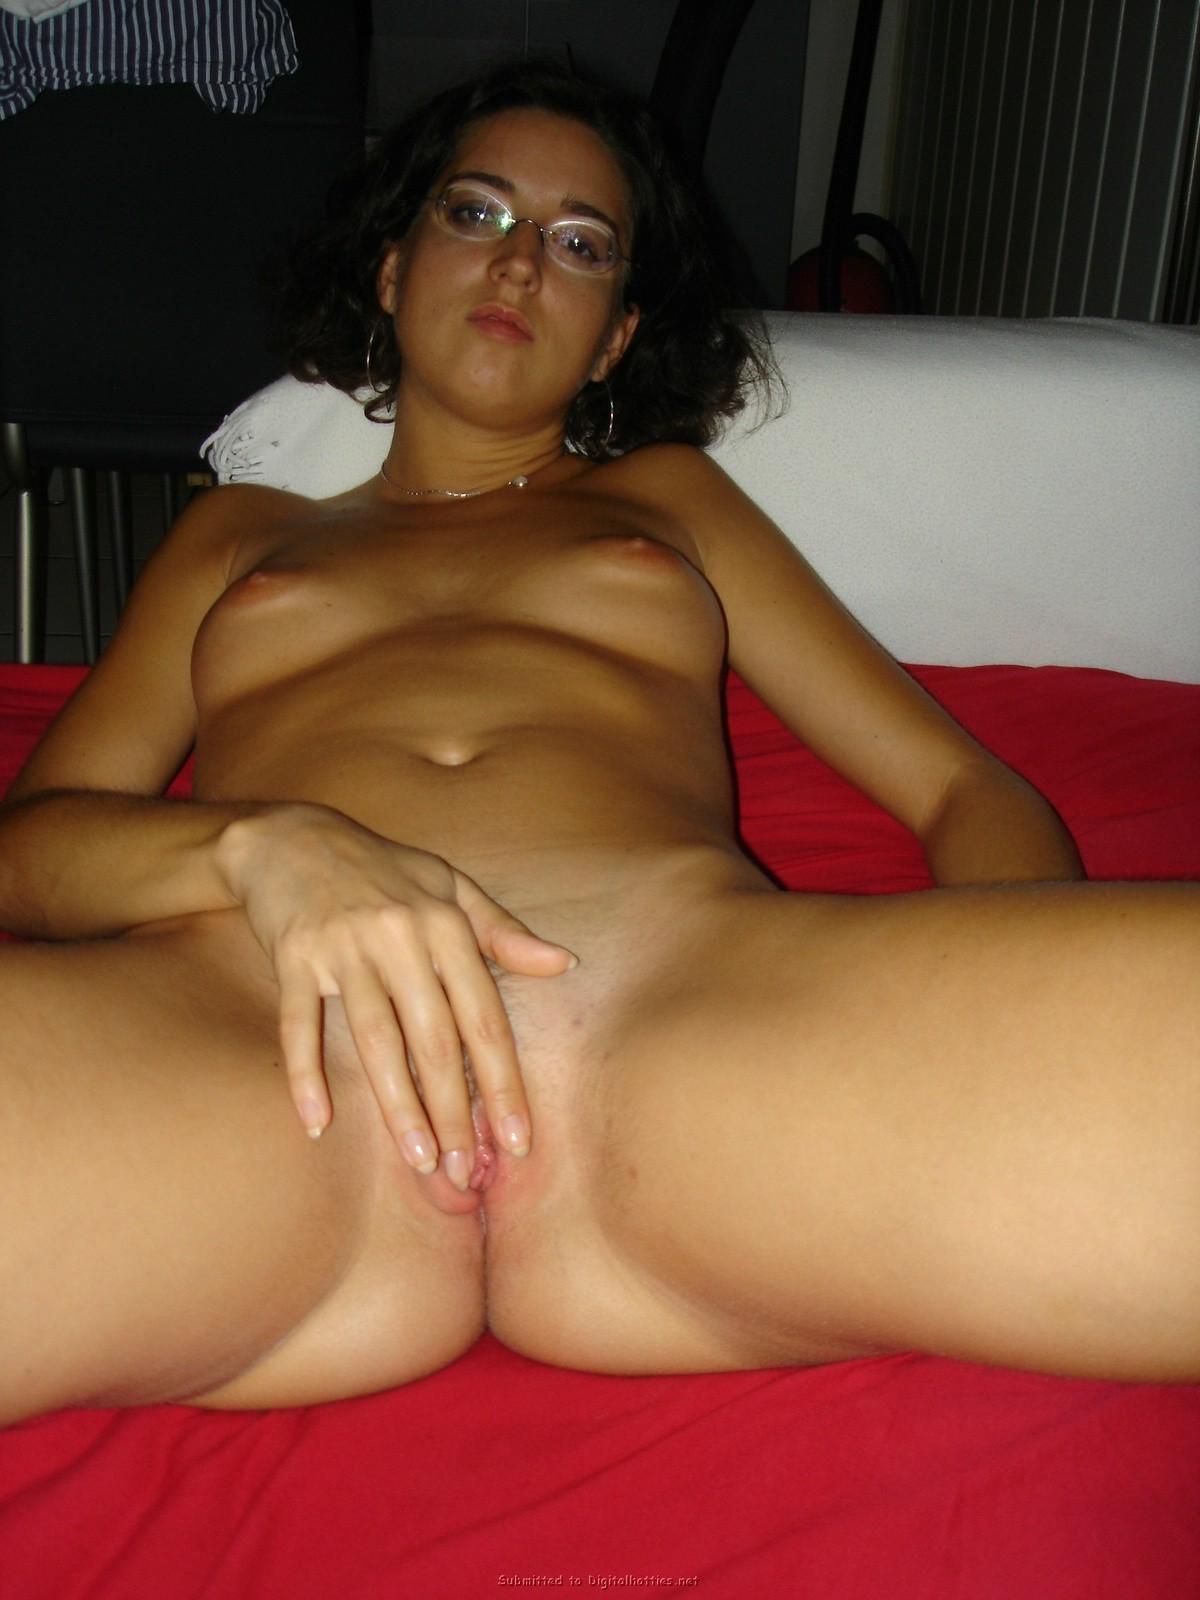 Latina girlfriend nude